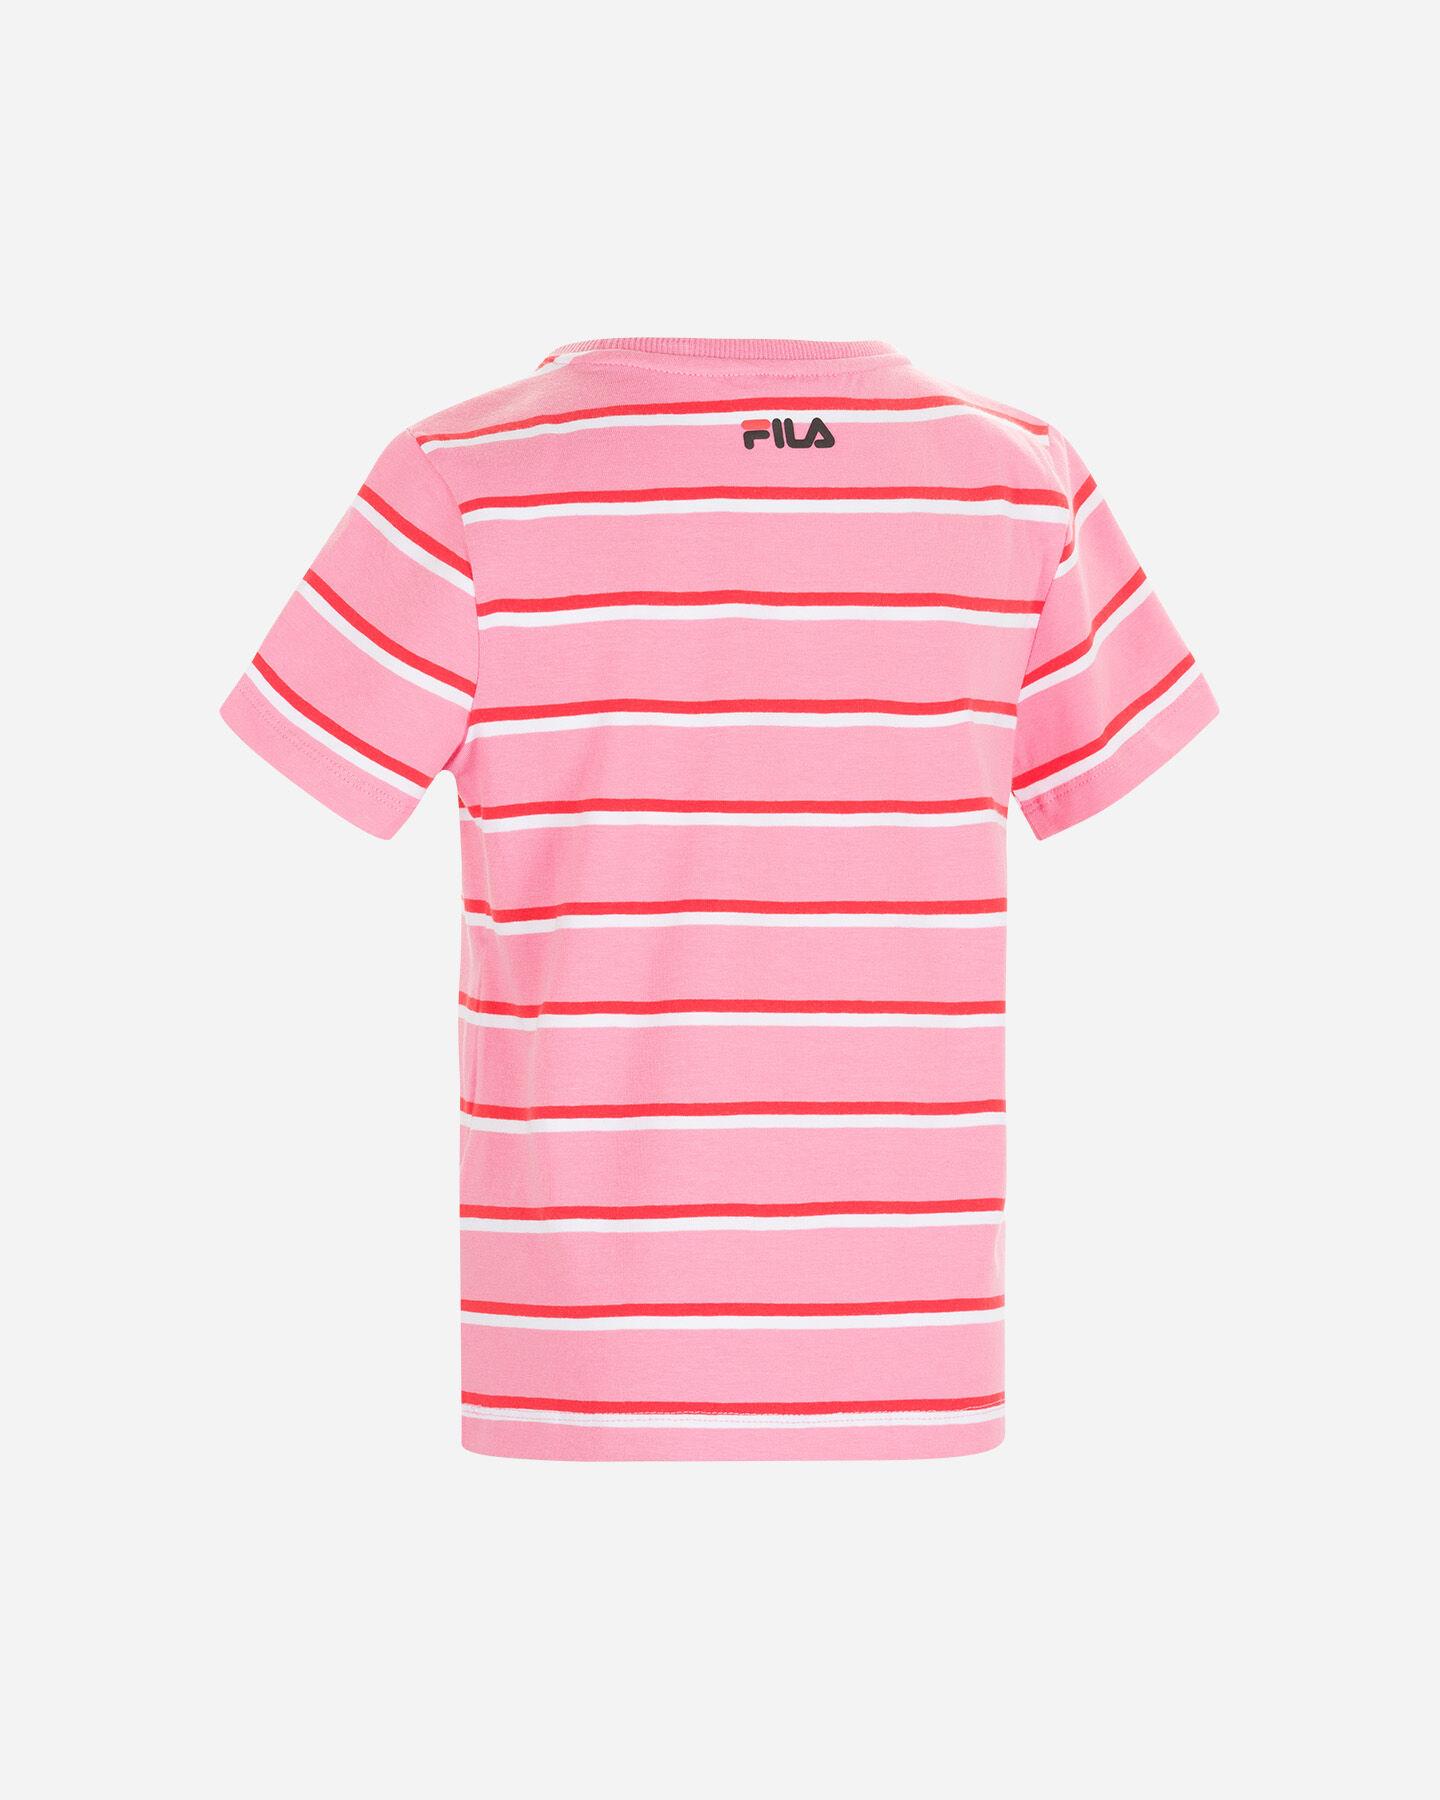 T-Shirt FILA STRIPES JR S4088698 scatto 1